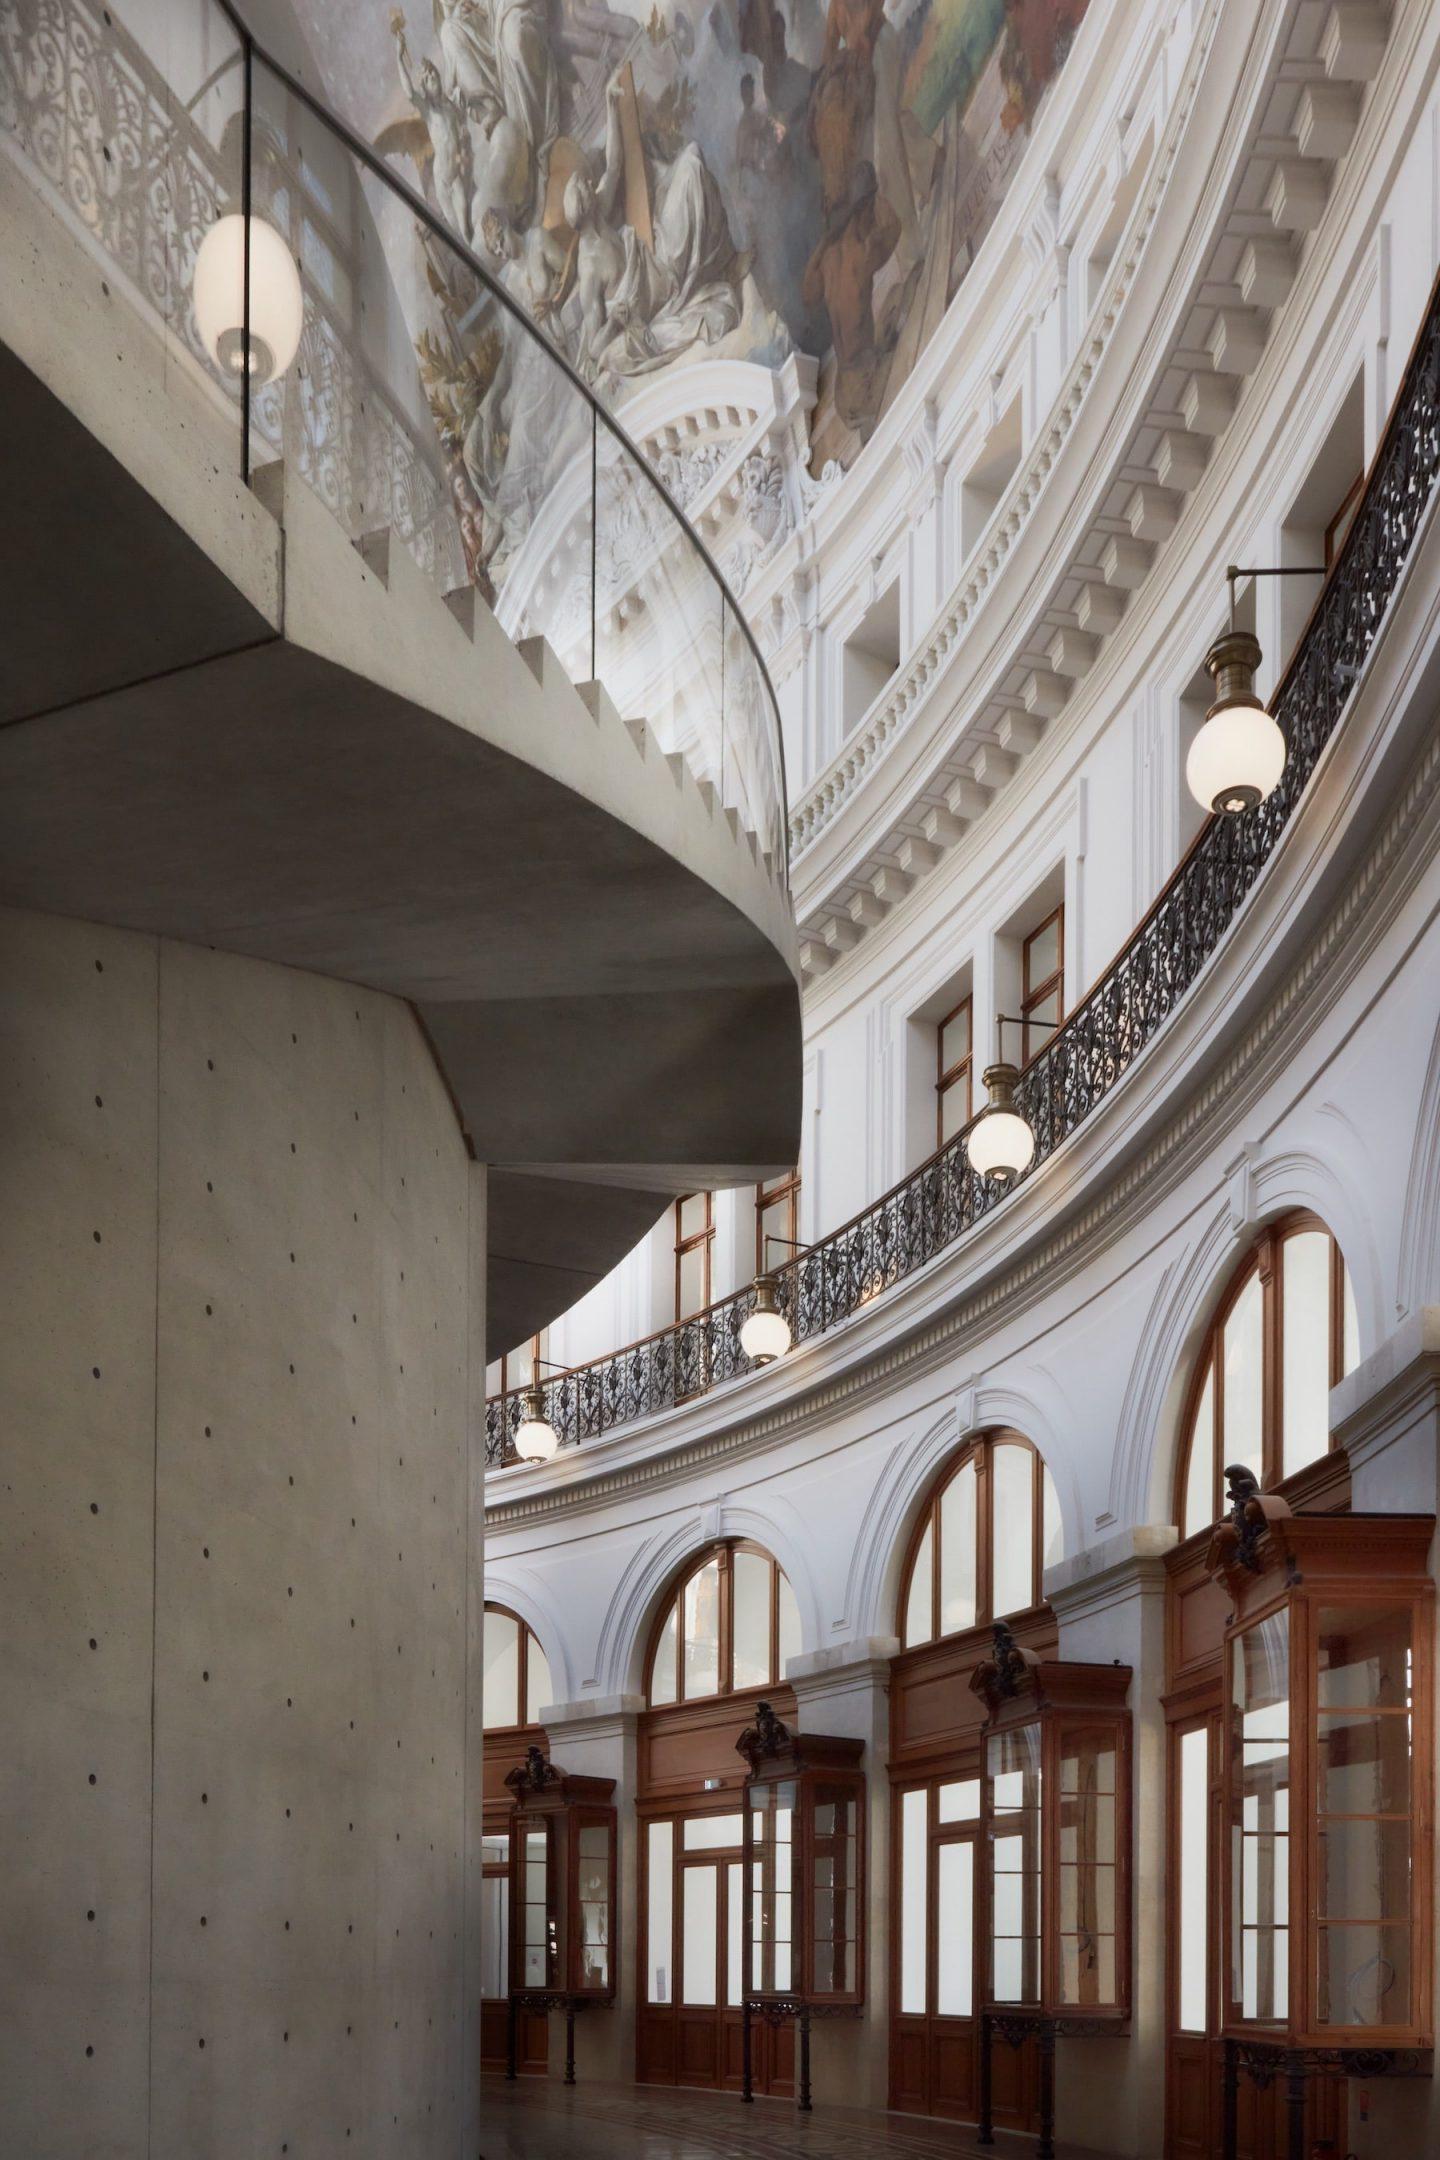 IGNANT-Architecture-Paris-Bourse-de-Commerce-Maxime-Tetard-09